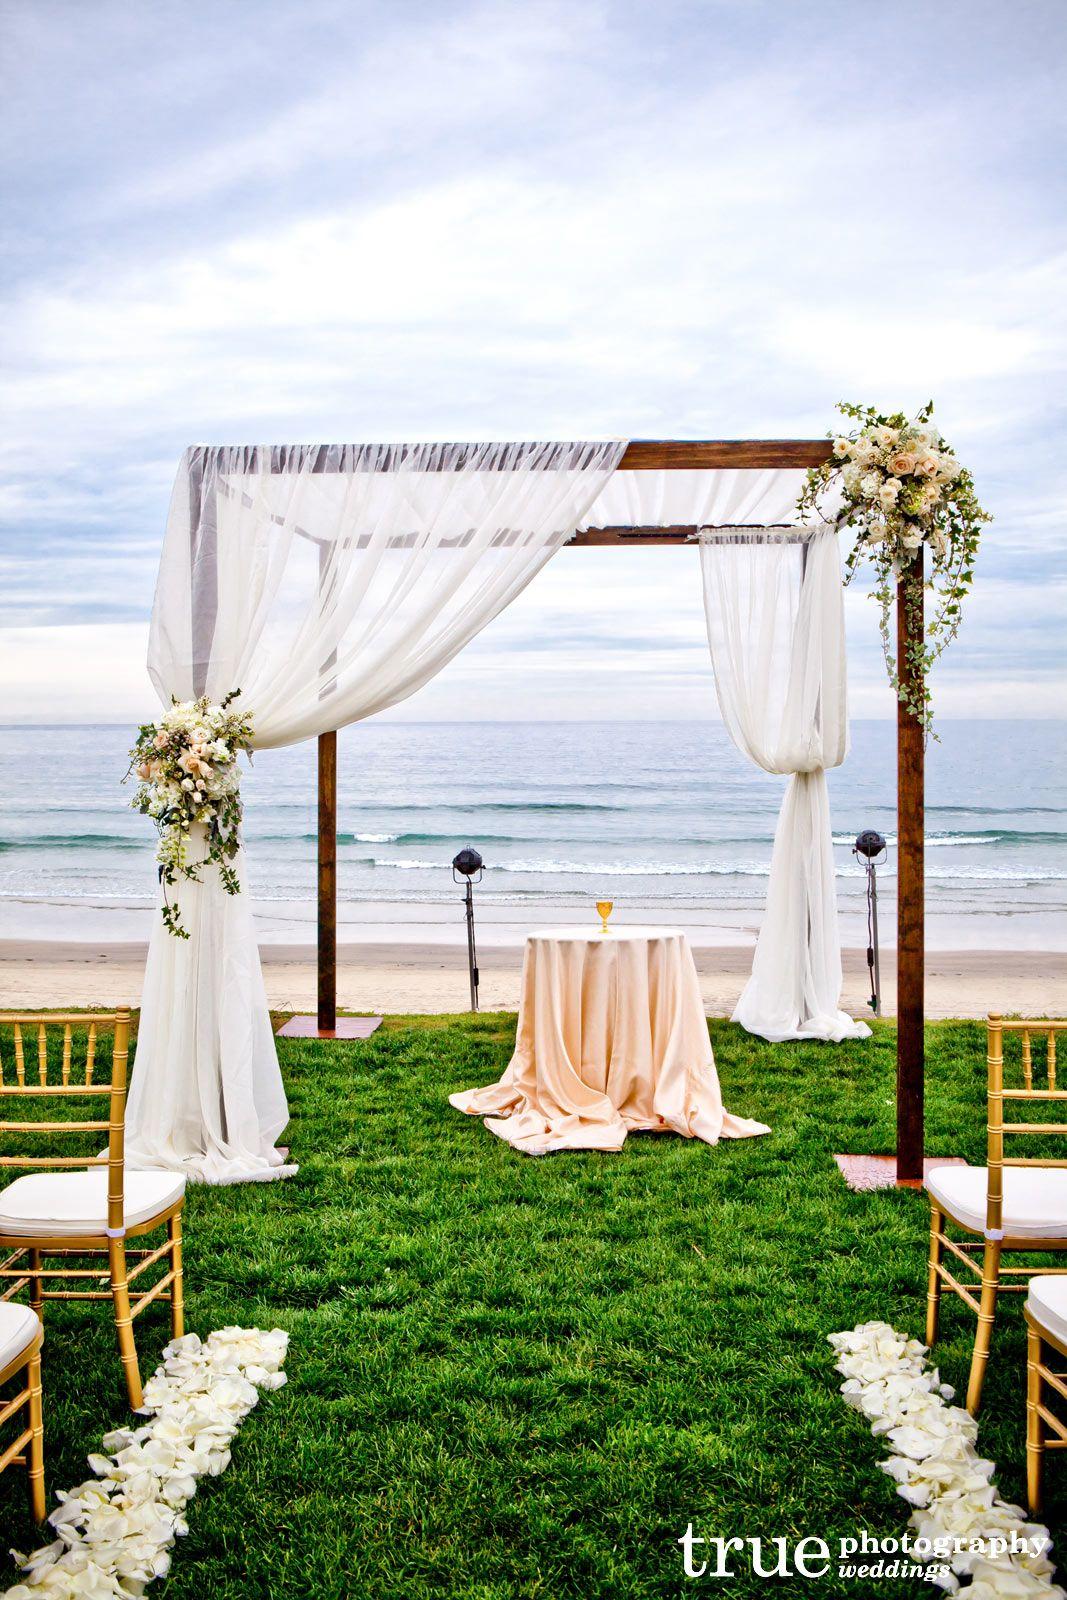 Wedding Canopy | Weddings | Pinterest | Wedding canopy, Romantic ...